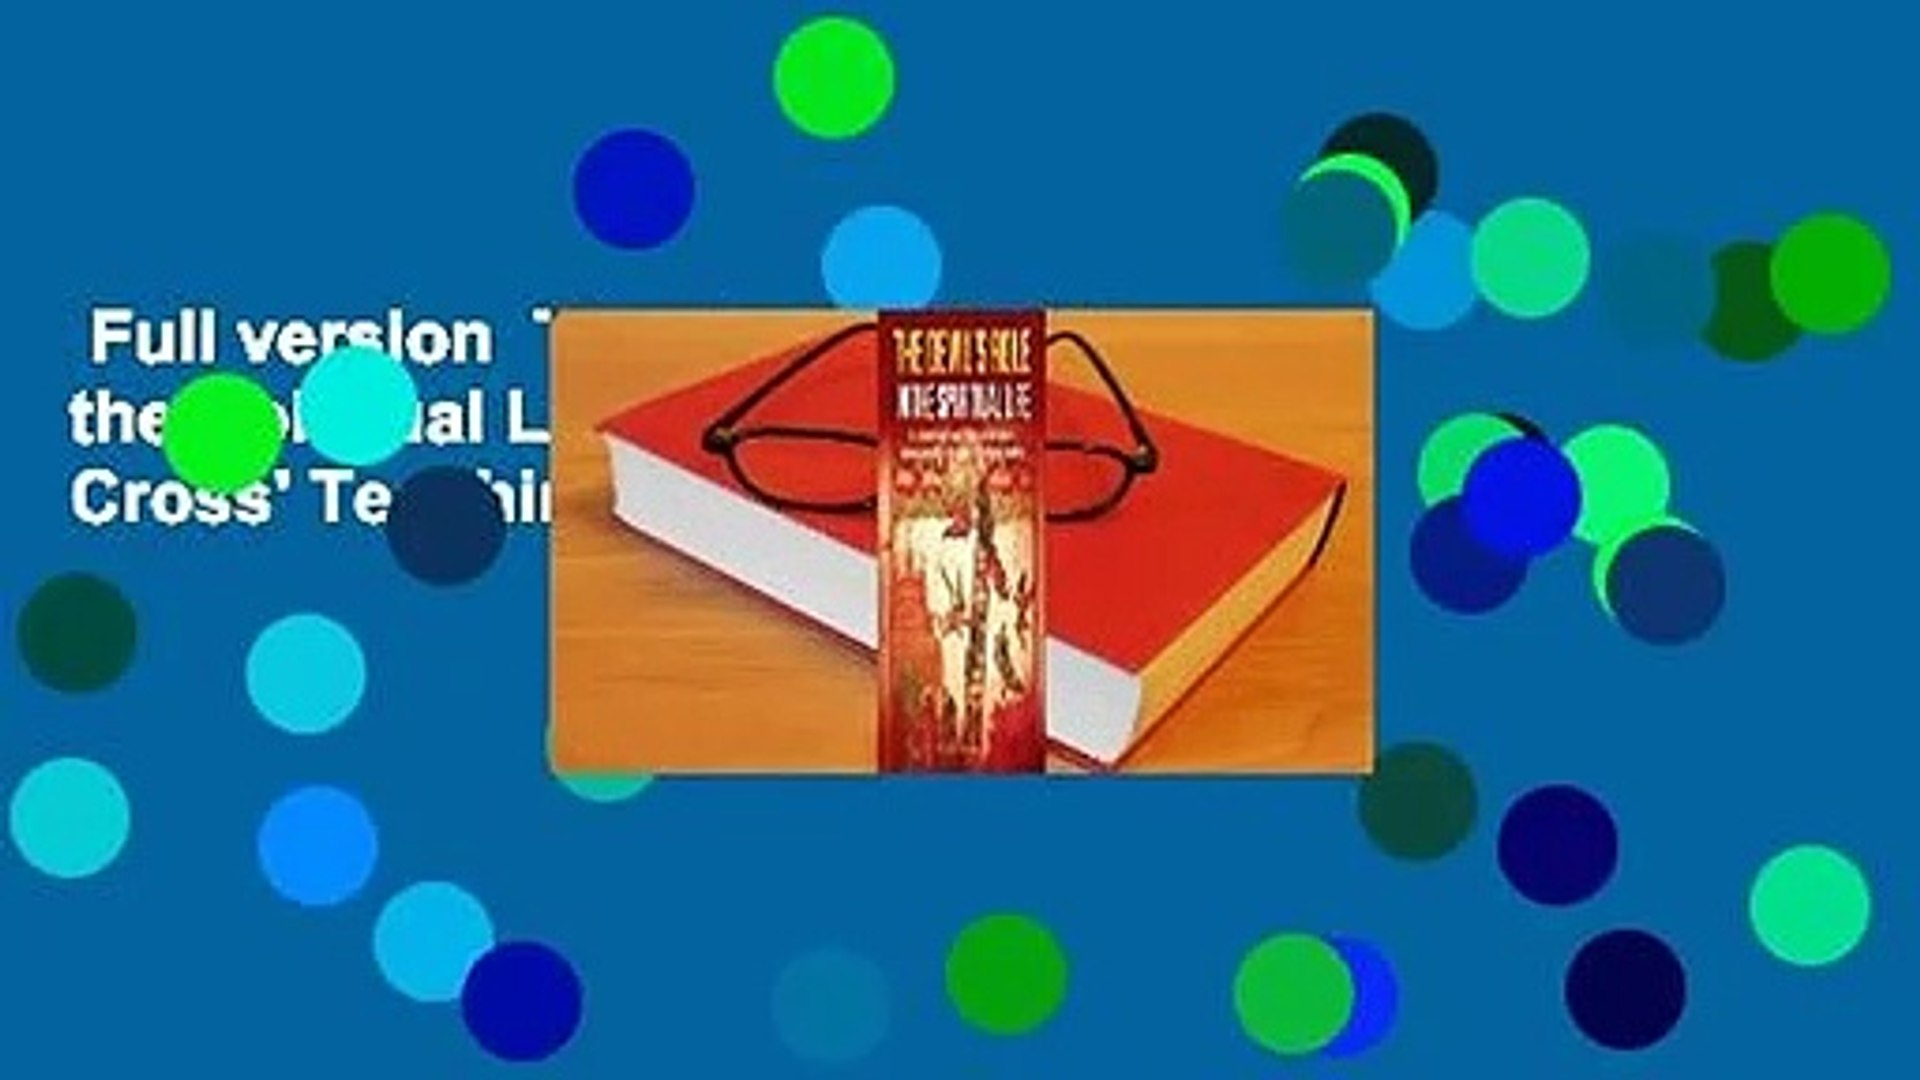 Full version  The Devil's Role in the Spiritual Life: St. John of the Cross' Teaching on S